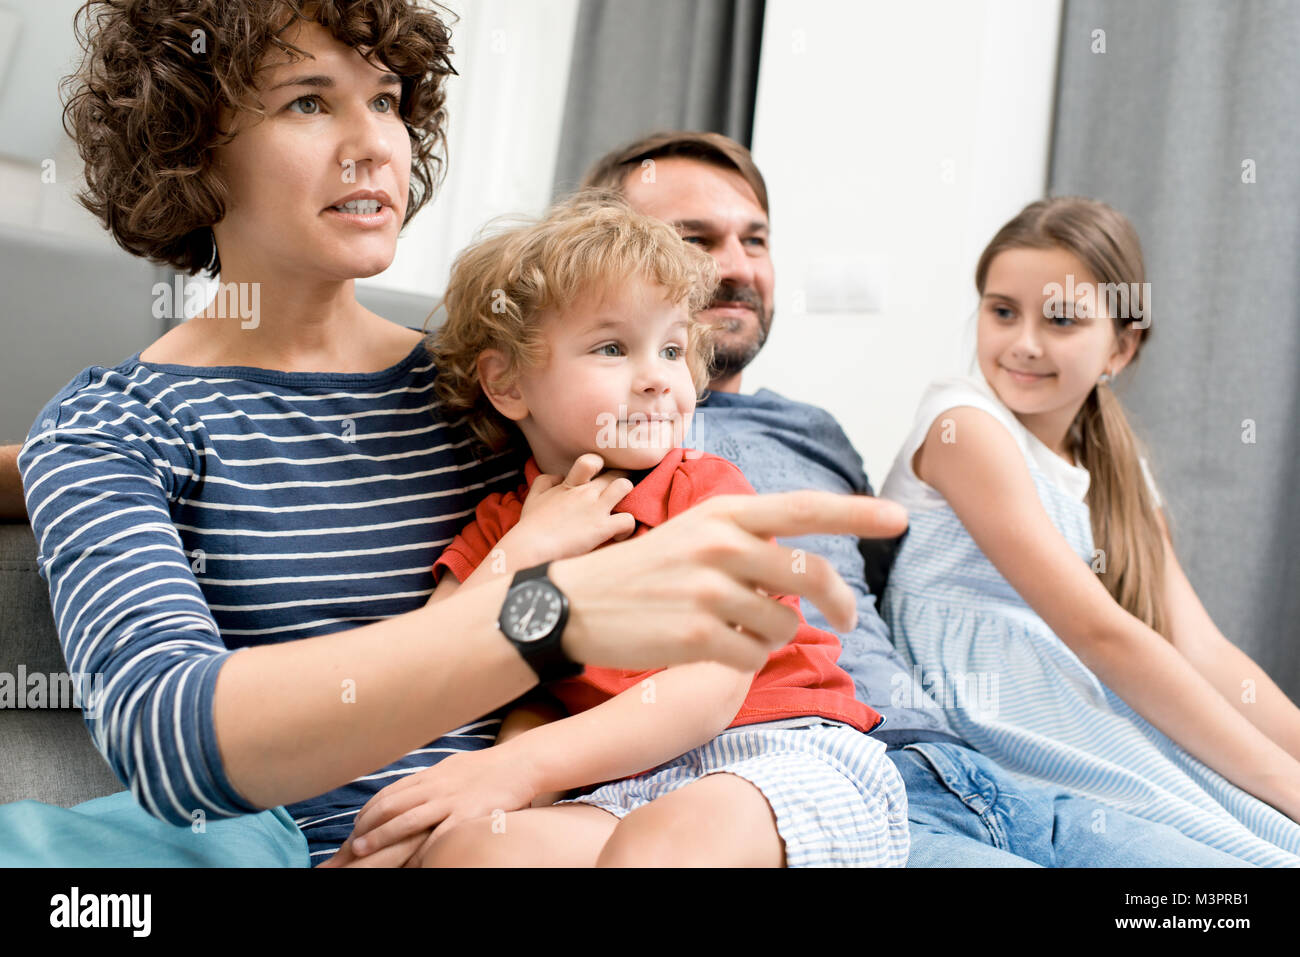 Family Watching TV - Stock Image